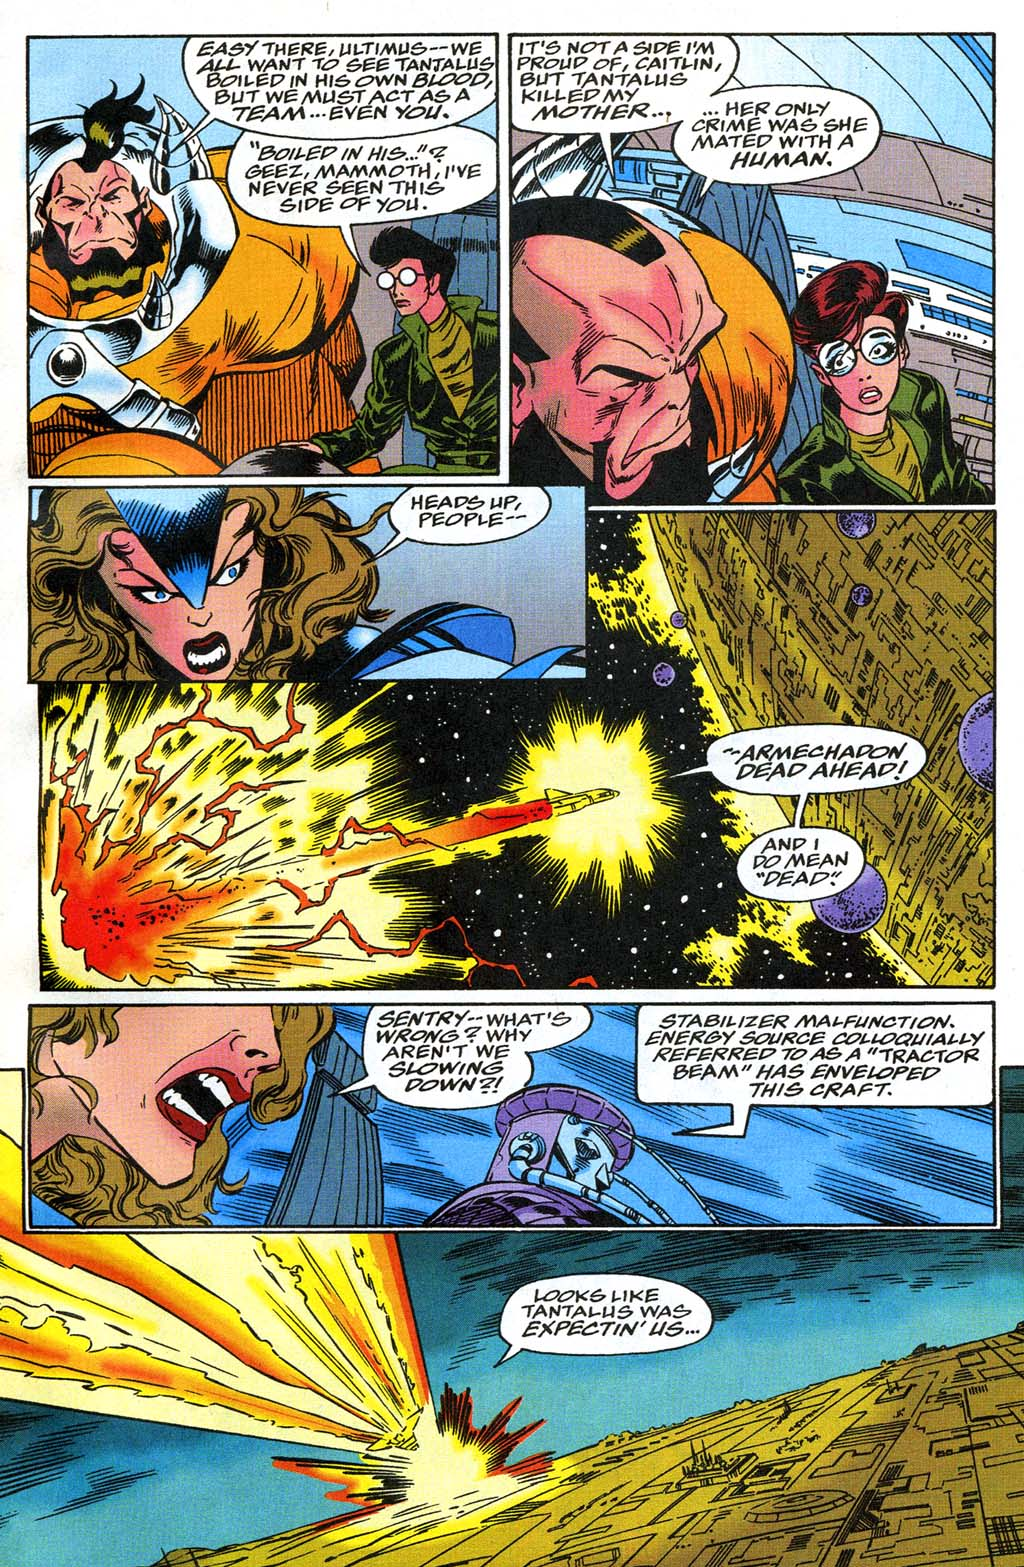 Read online Blackwulf comic -  Issue #8 - 9